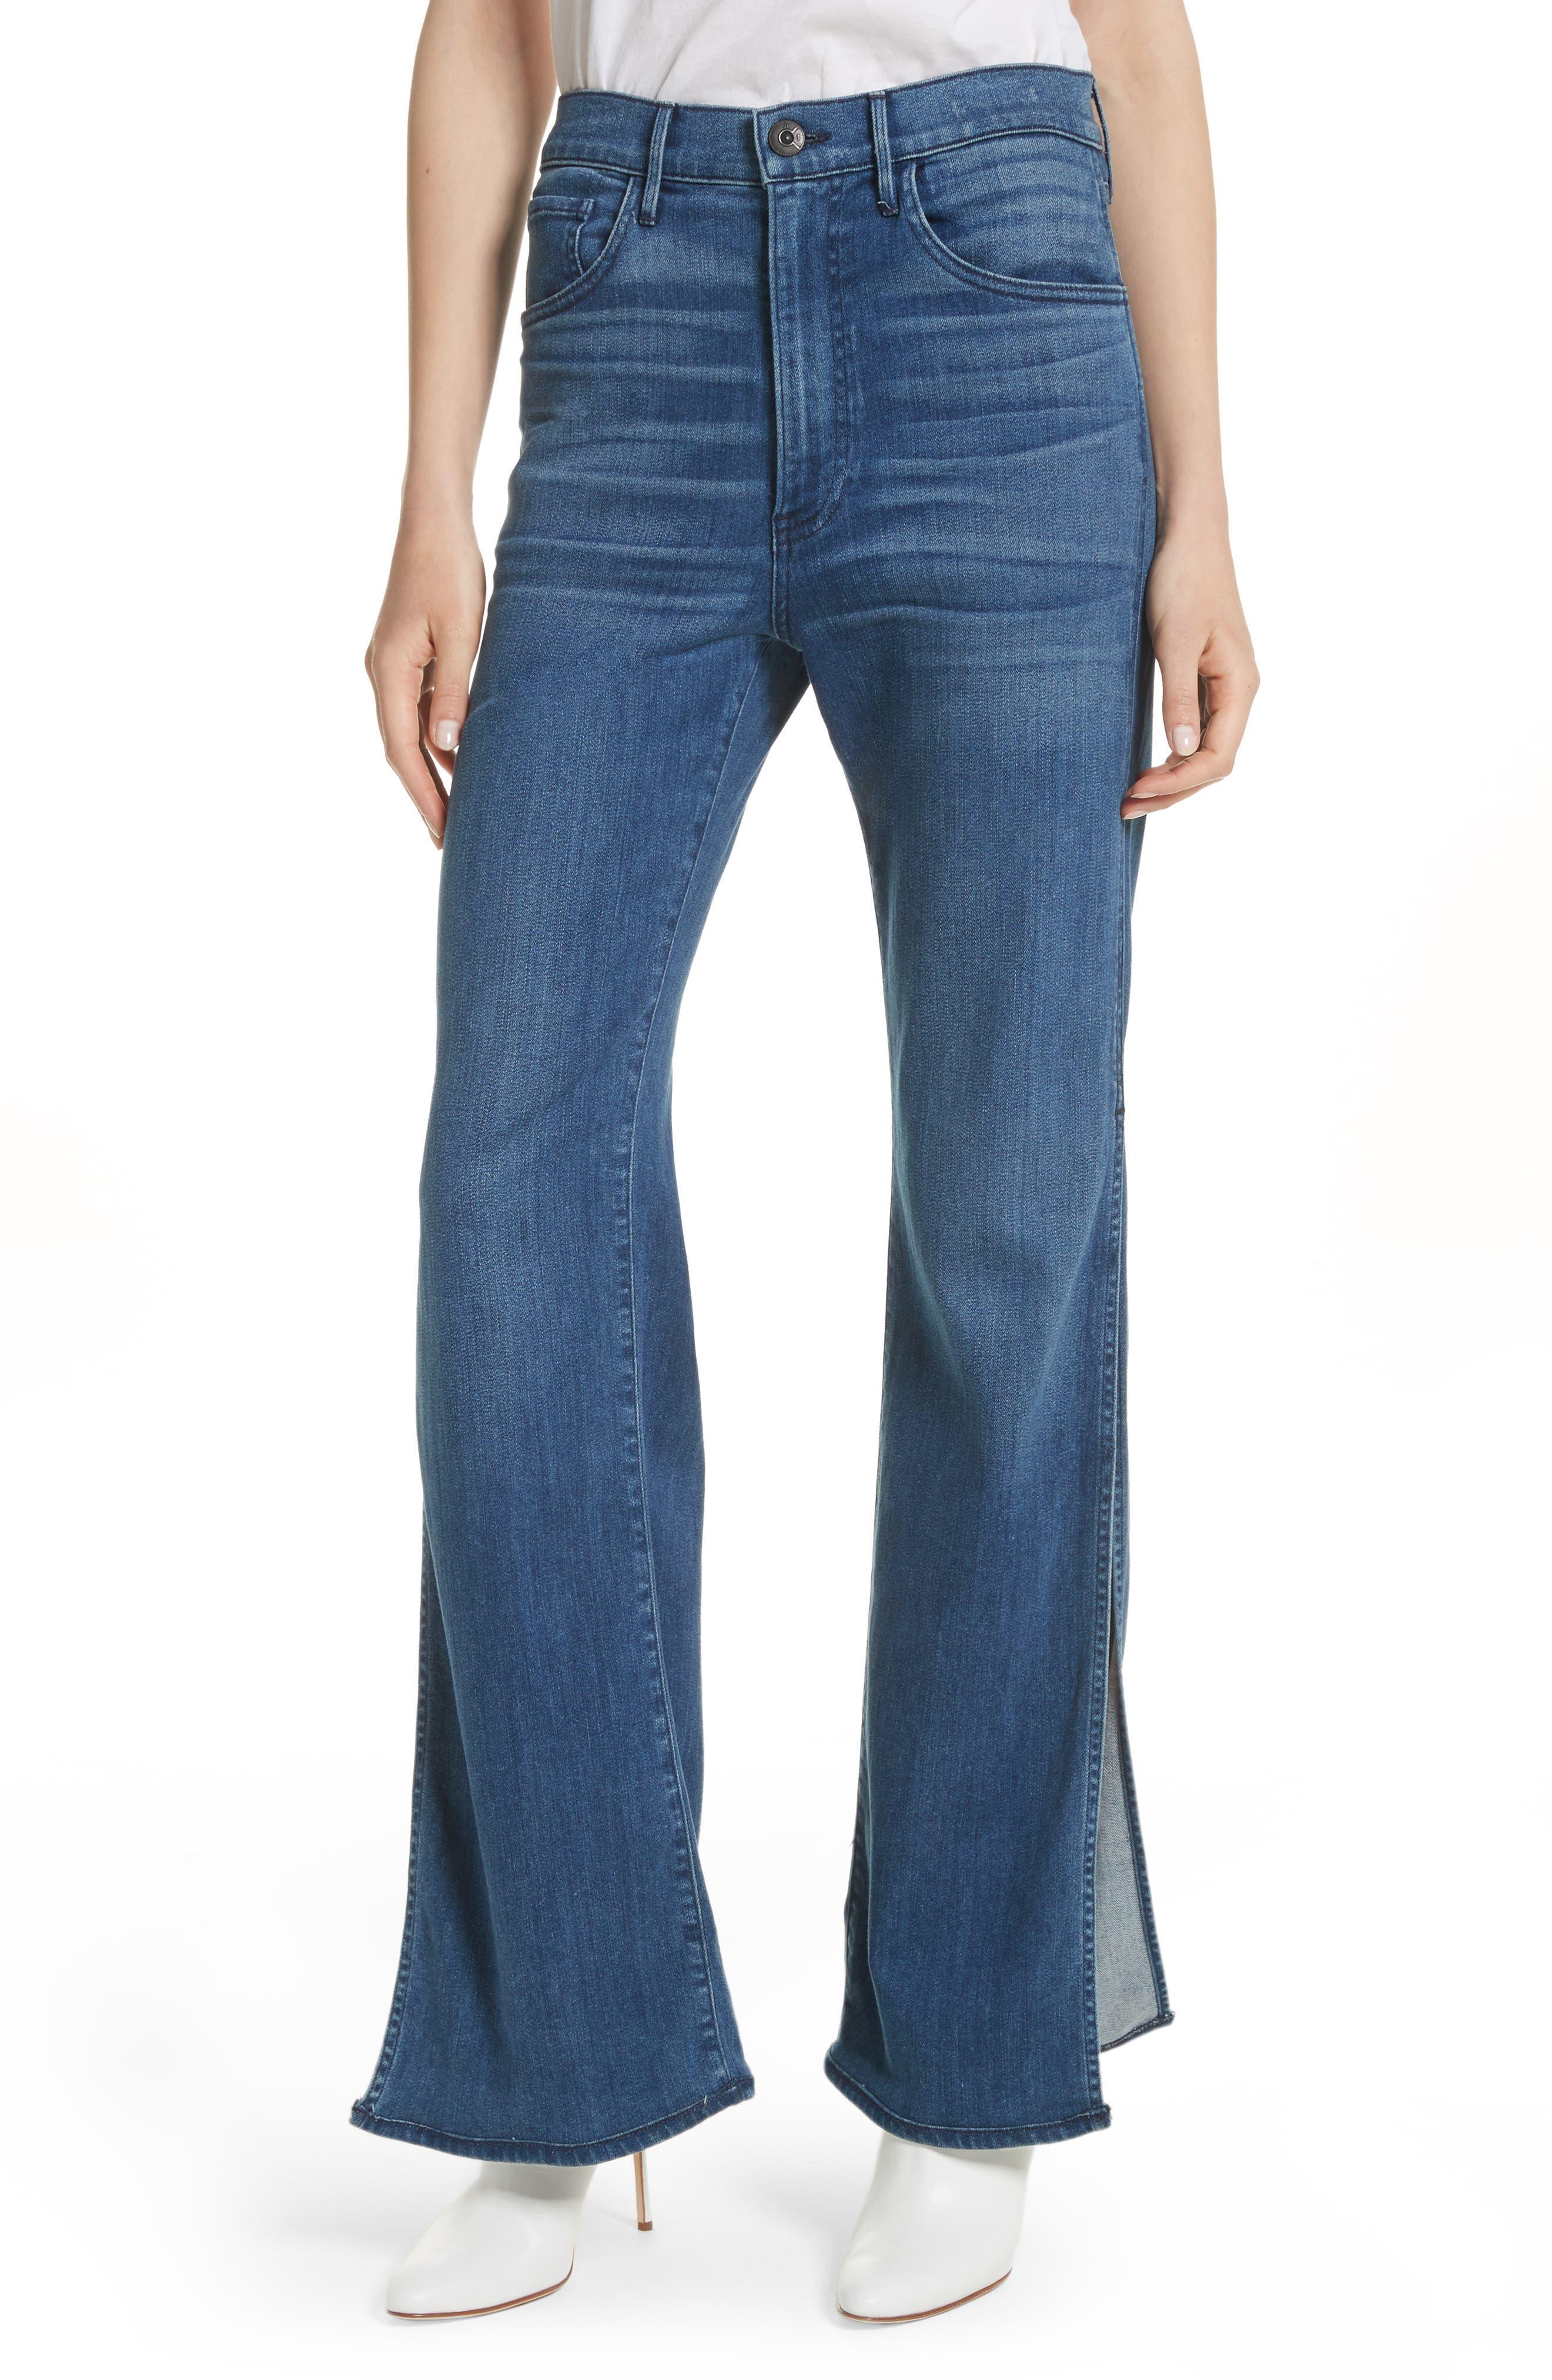 W4 Adeline High Waist Split Flare Jeans,                         Main,                         color, 426